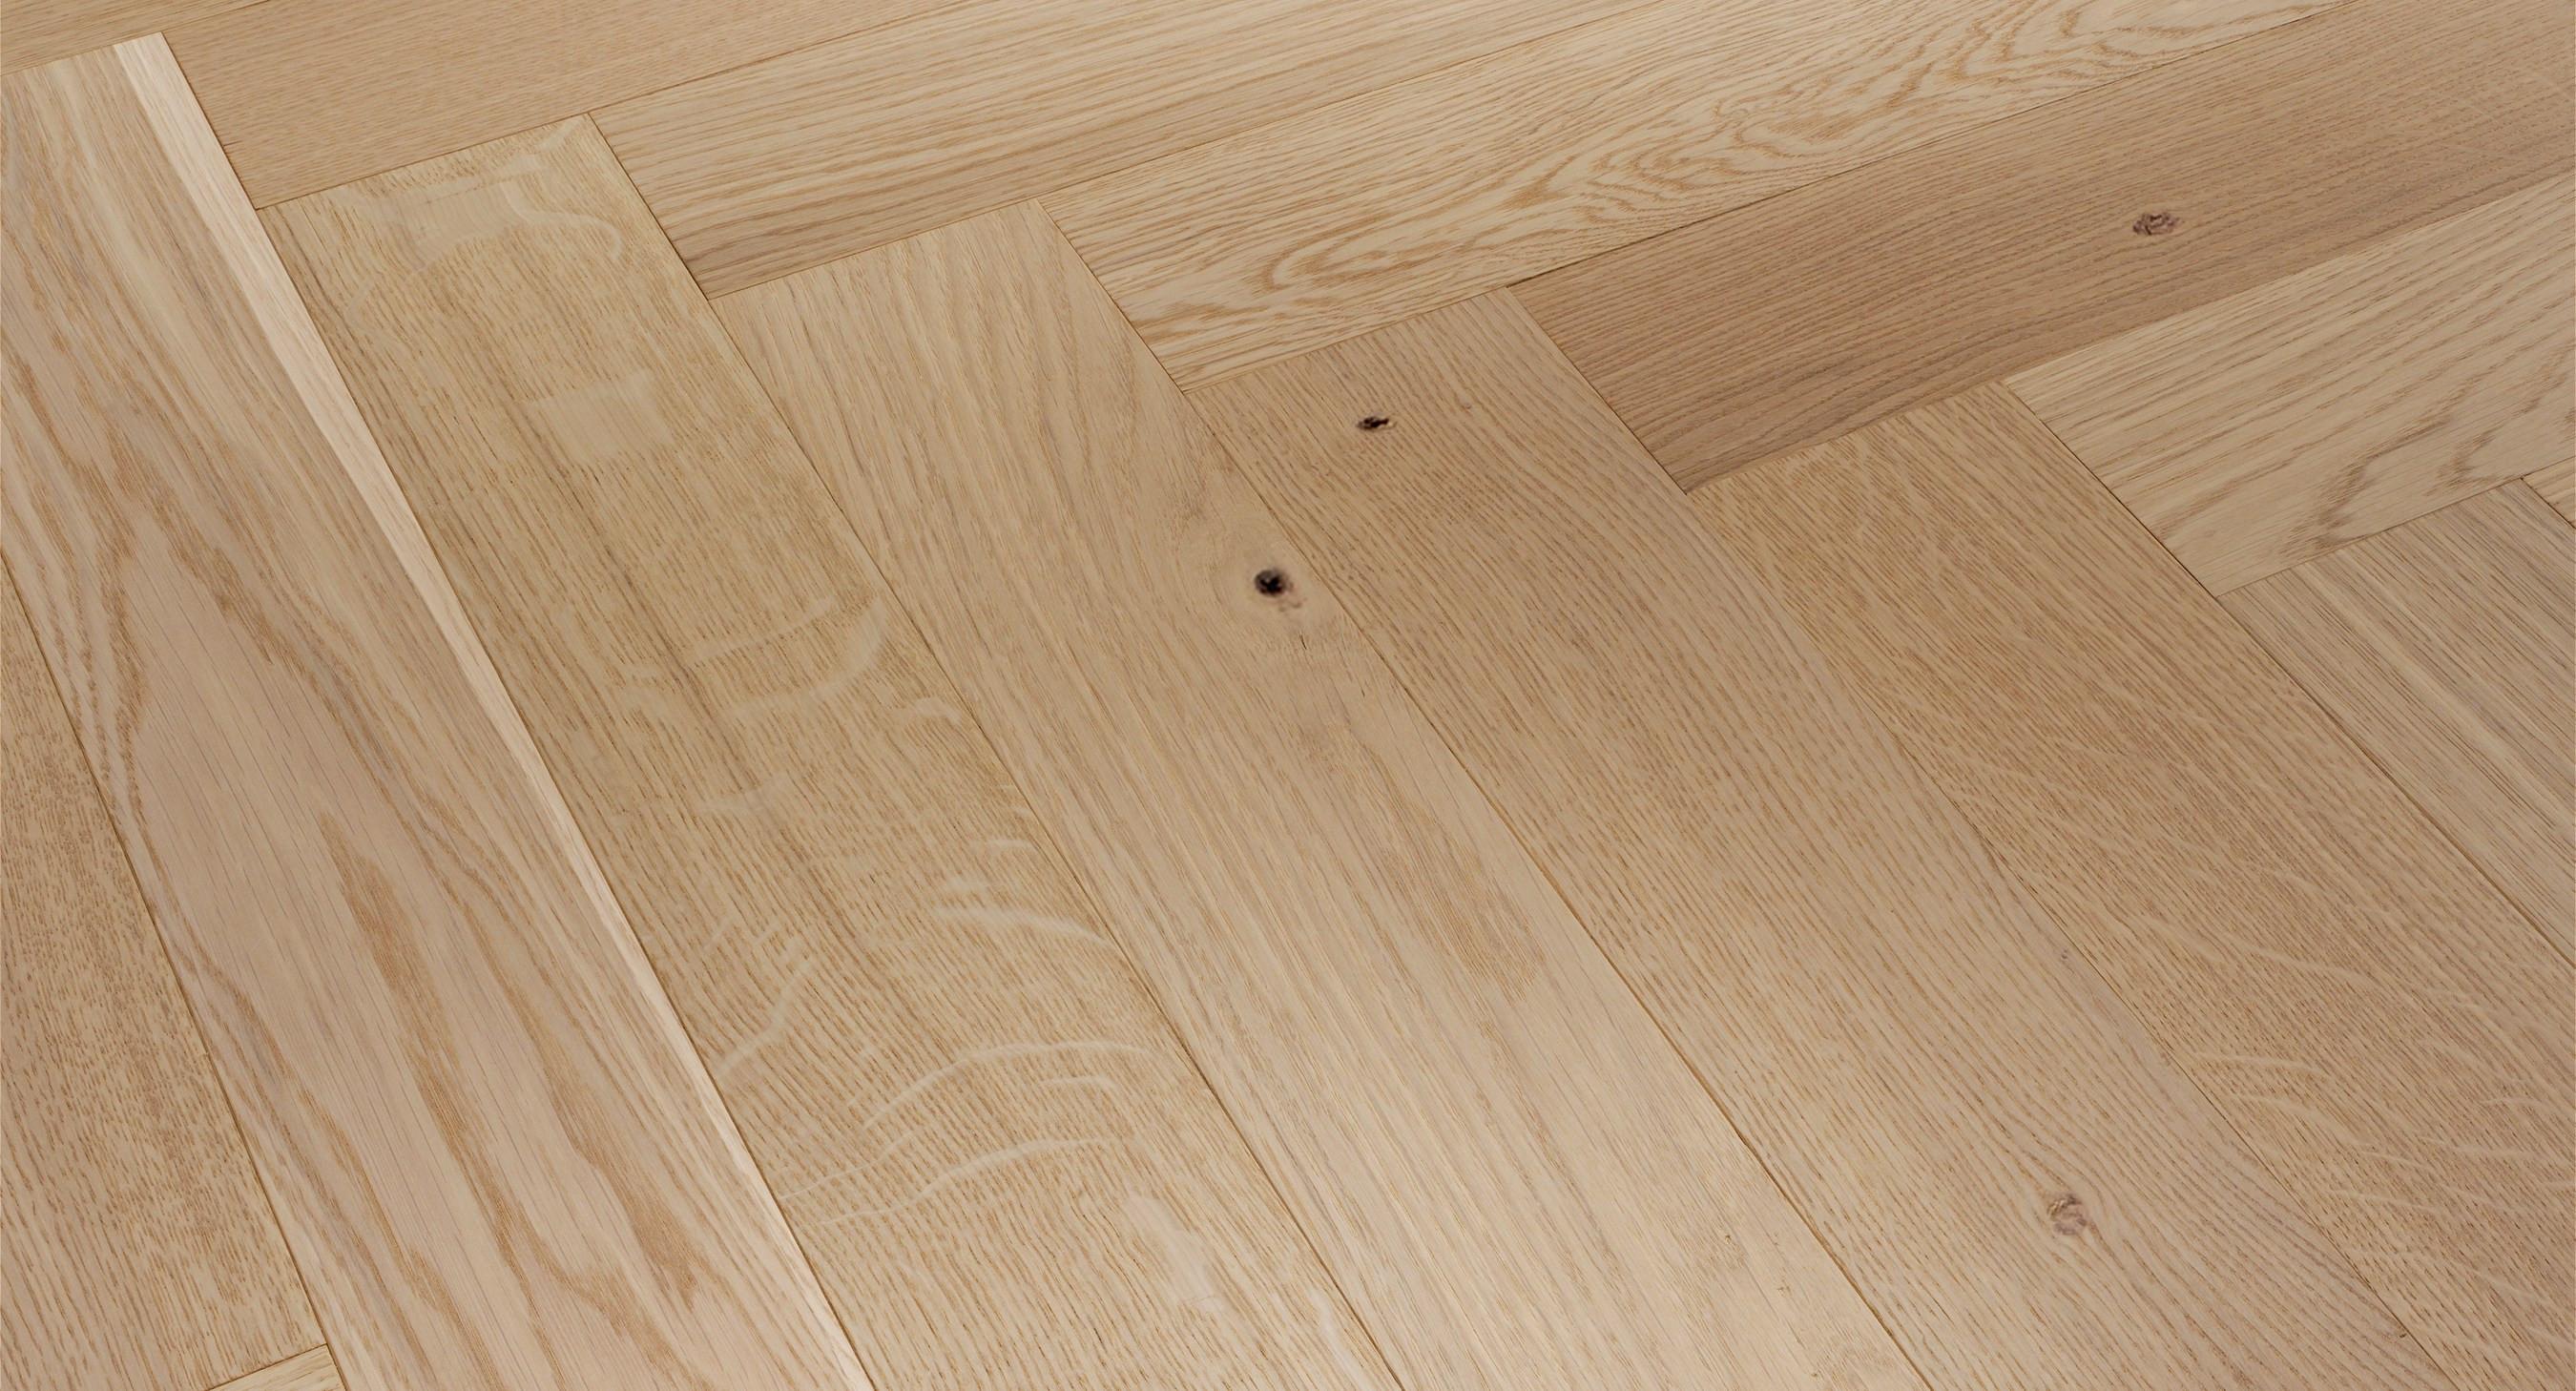 images of hickory hardwood flooring of engineered wood flooring click ivoiregion regarding mohawk engineered